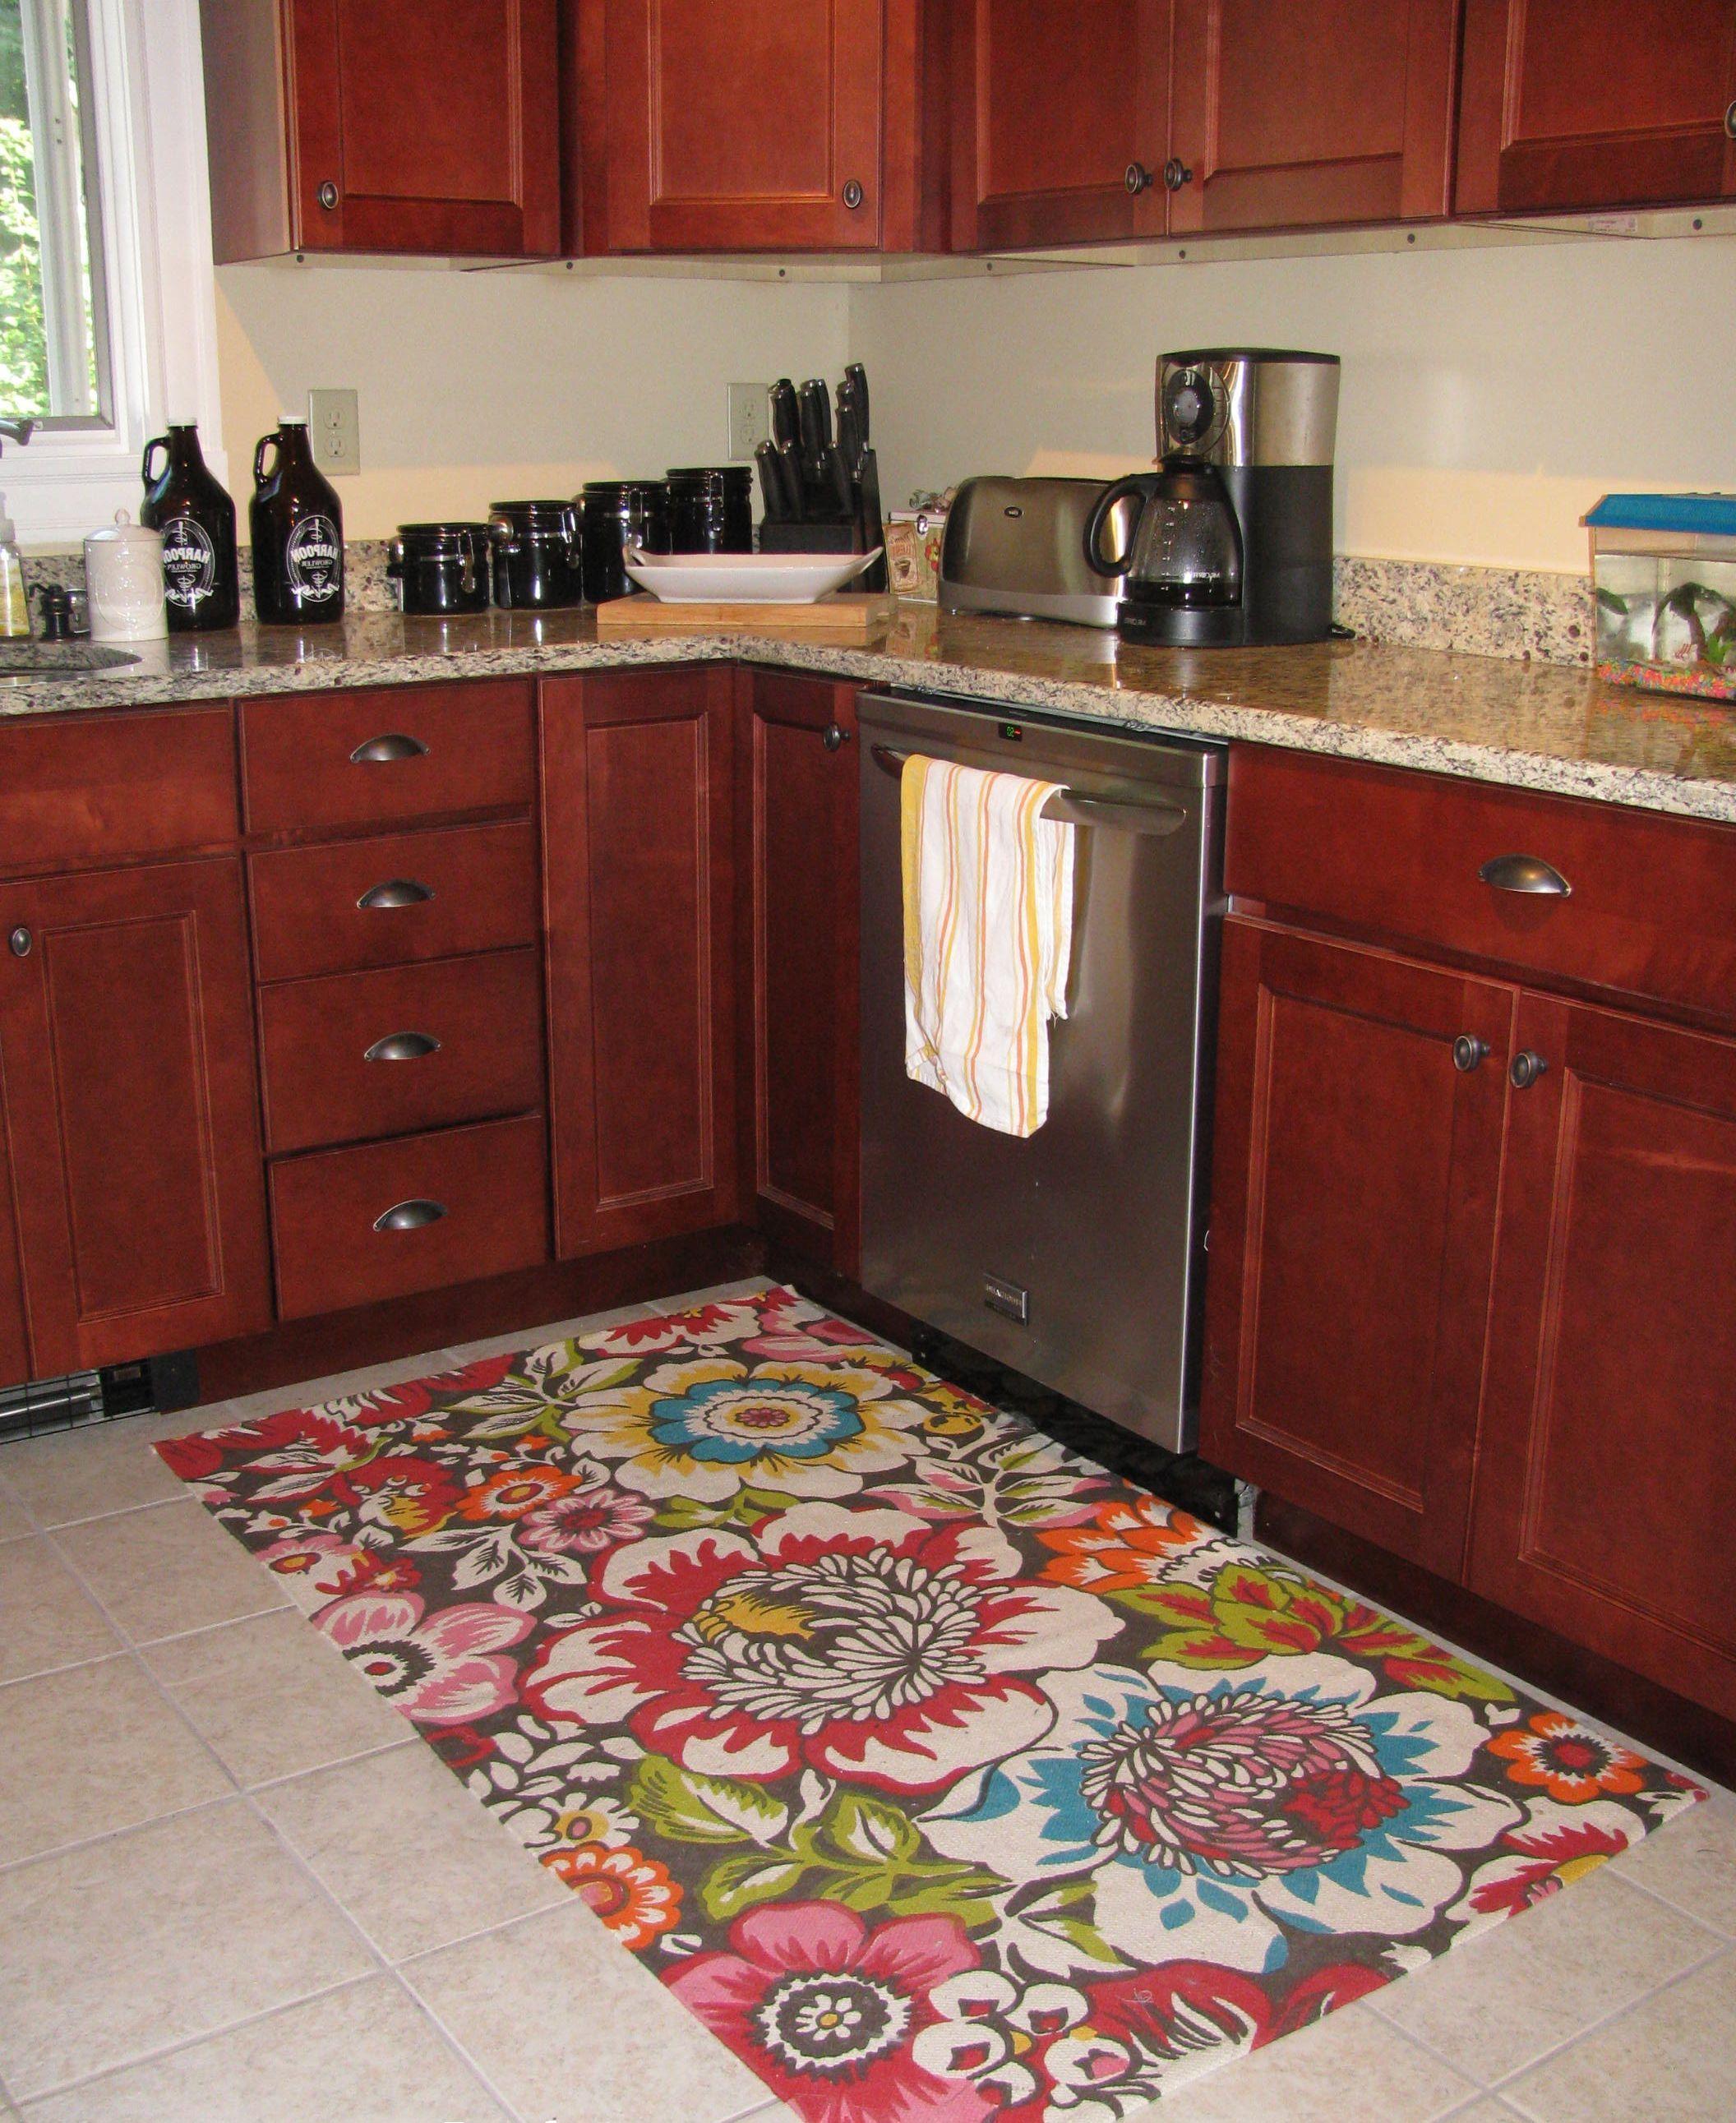 Kitchen Floor Mats and Ergonomic Type of Mats) in